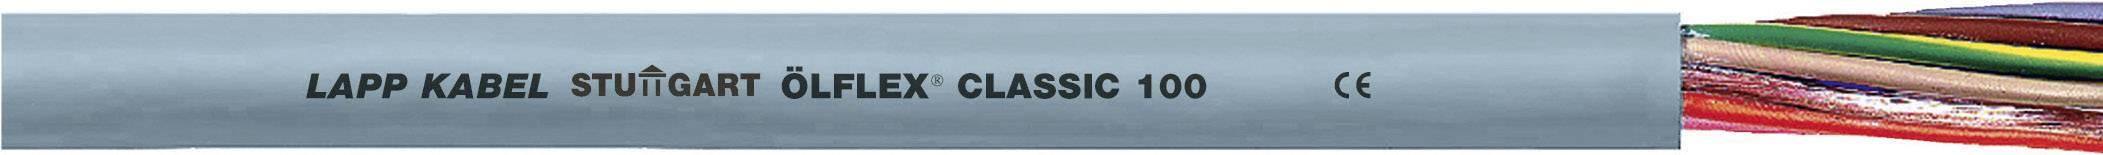 Kabel LappKabel Ölflex CLASSIC 100 7G10 (0010111), PVC, 21,7 mm, 750 V, šedá, 1000 m